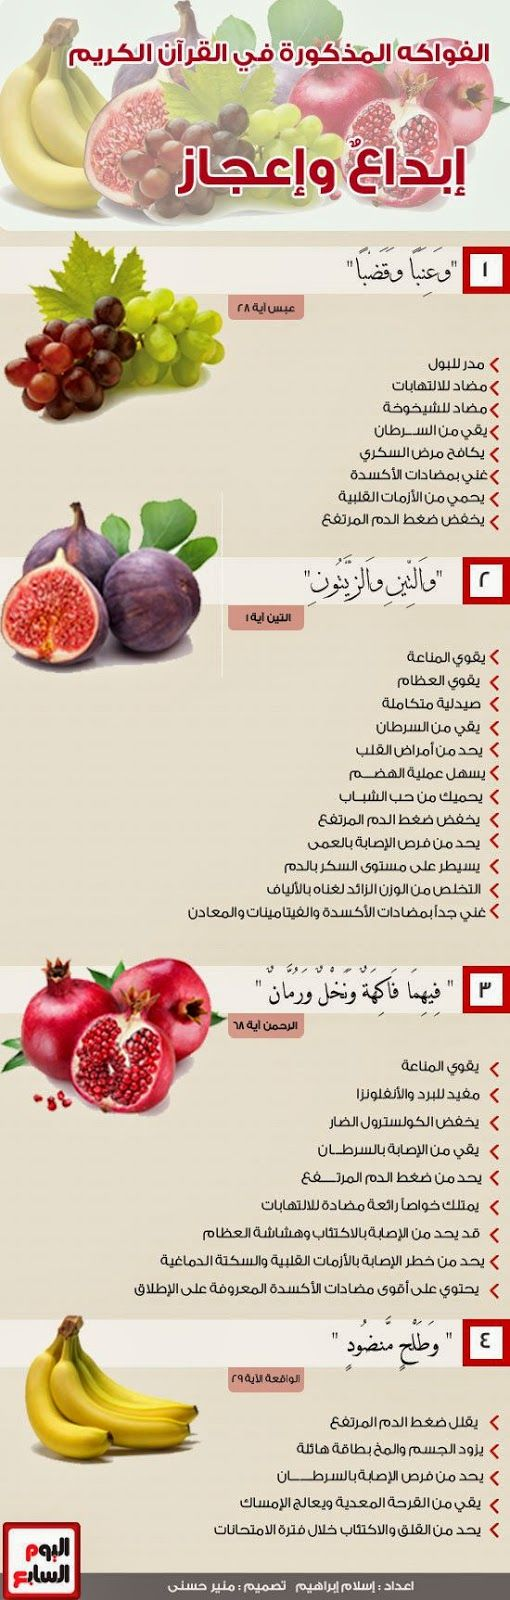 Mahalet Damana: إنفوجرافيك - الفواكه المذكورة في القرآن الكريم: